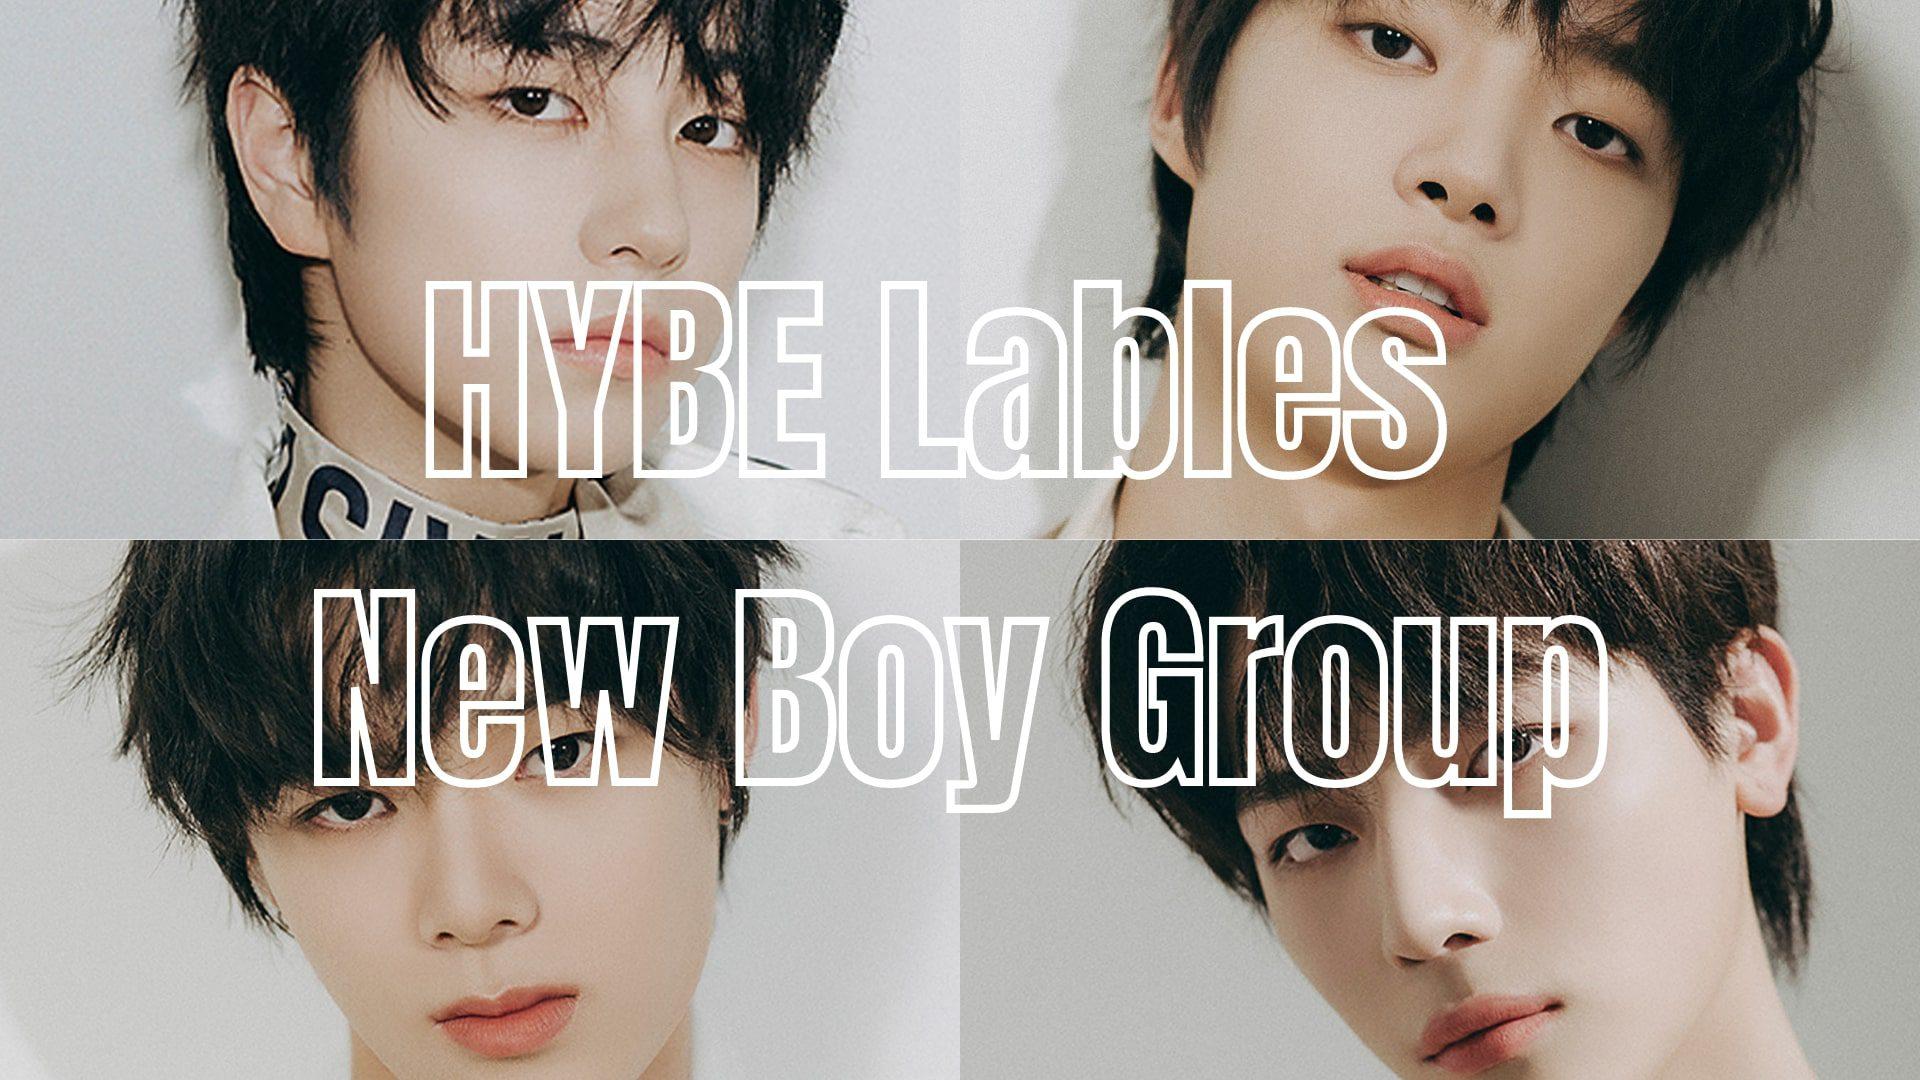 HYBE new boy group